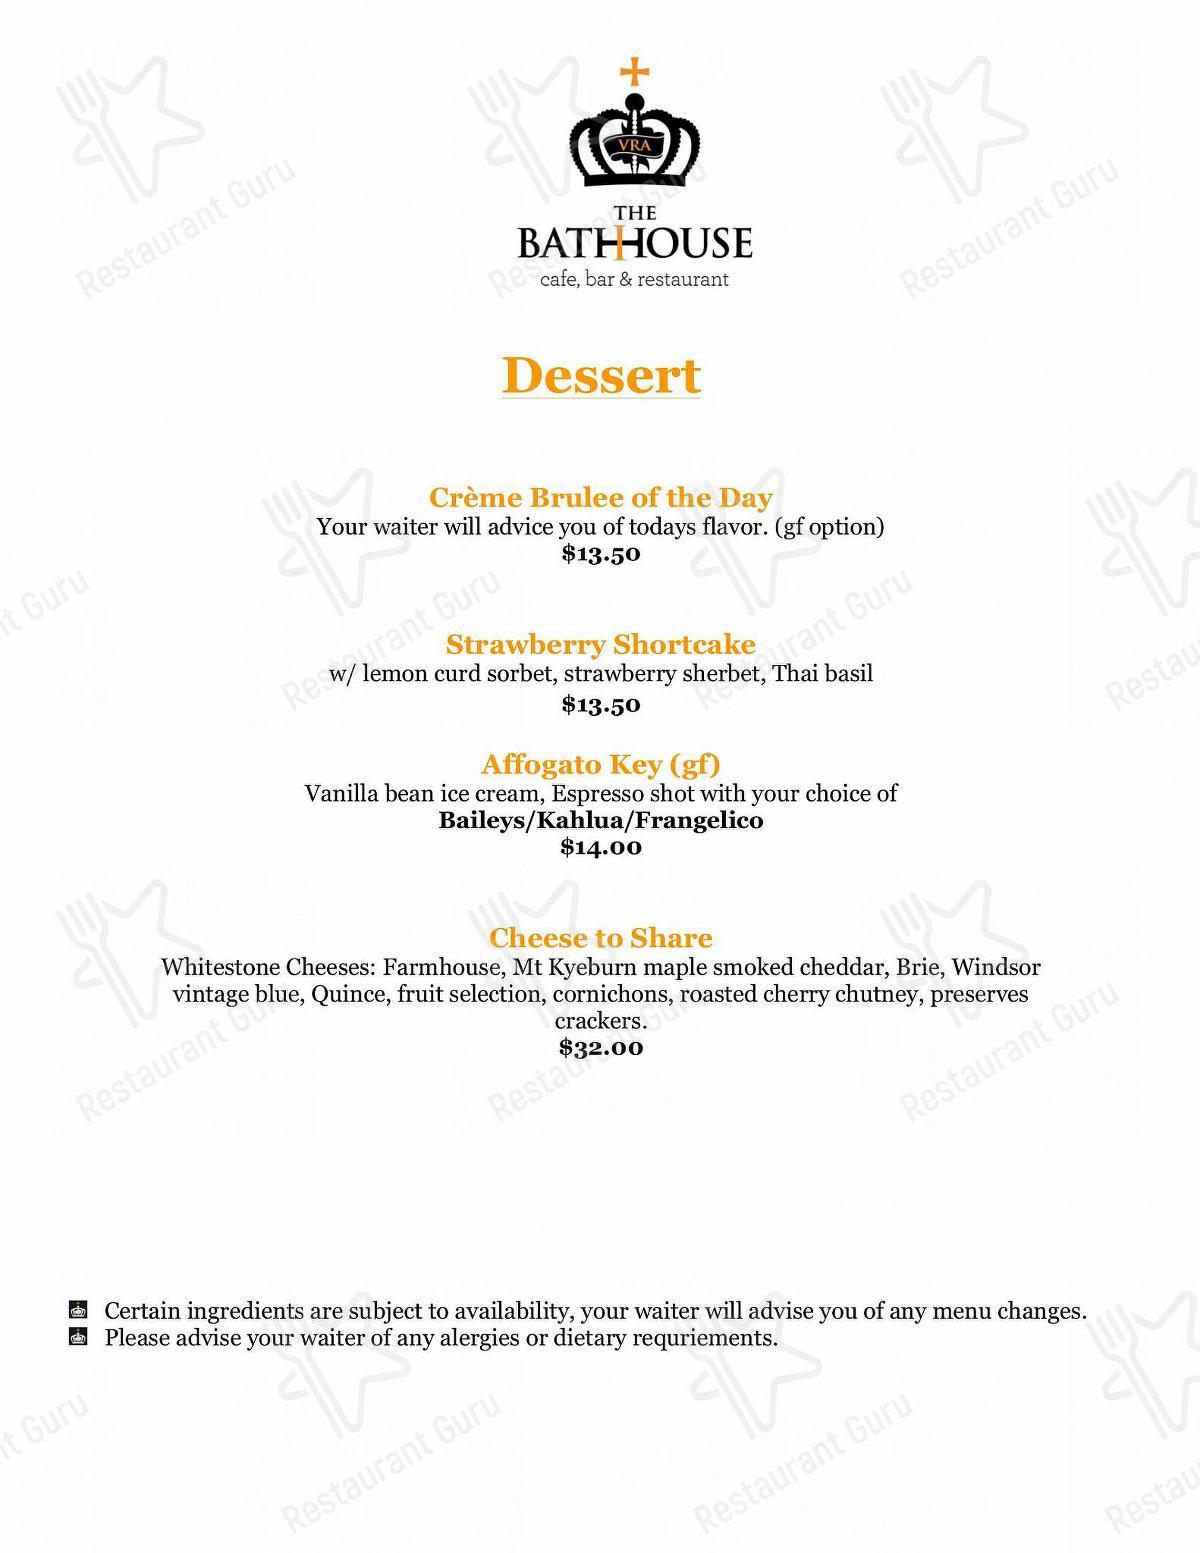 Menu for the The Bathhouse pub & bar